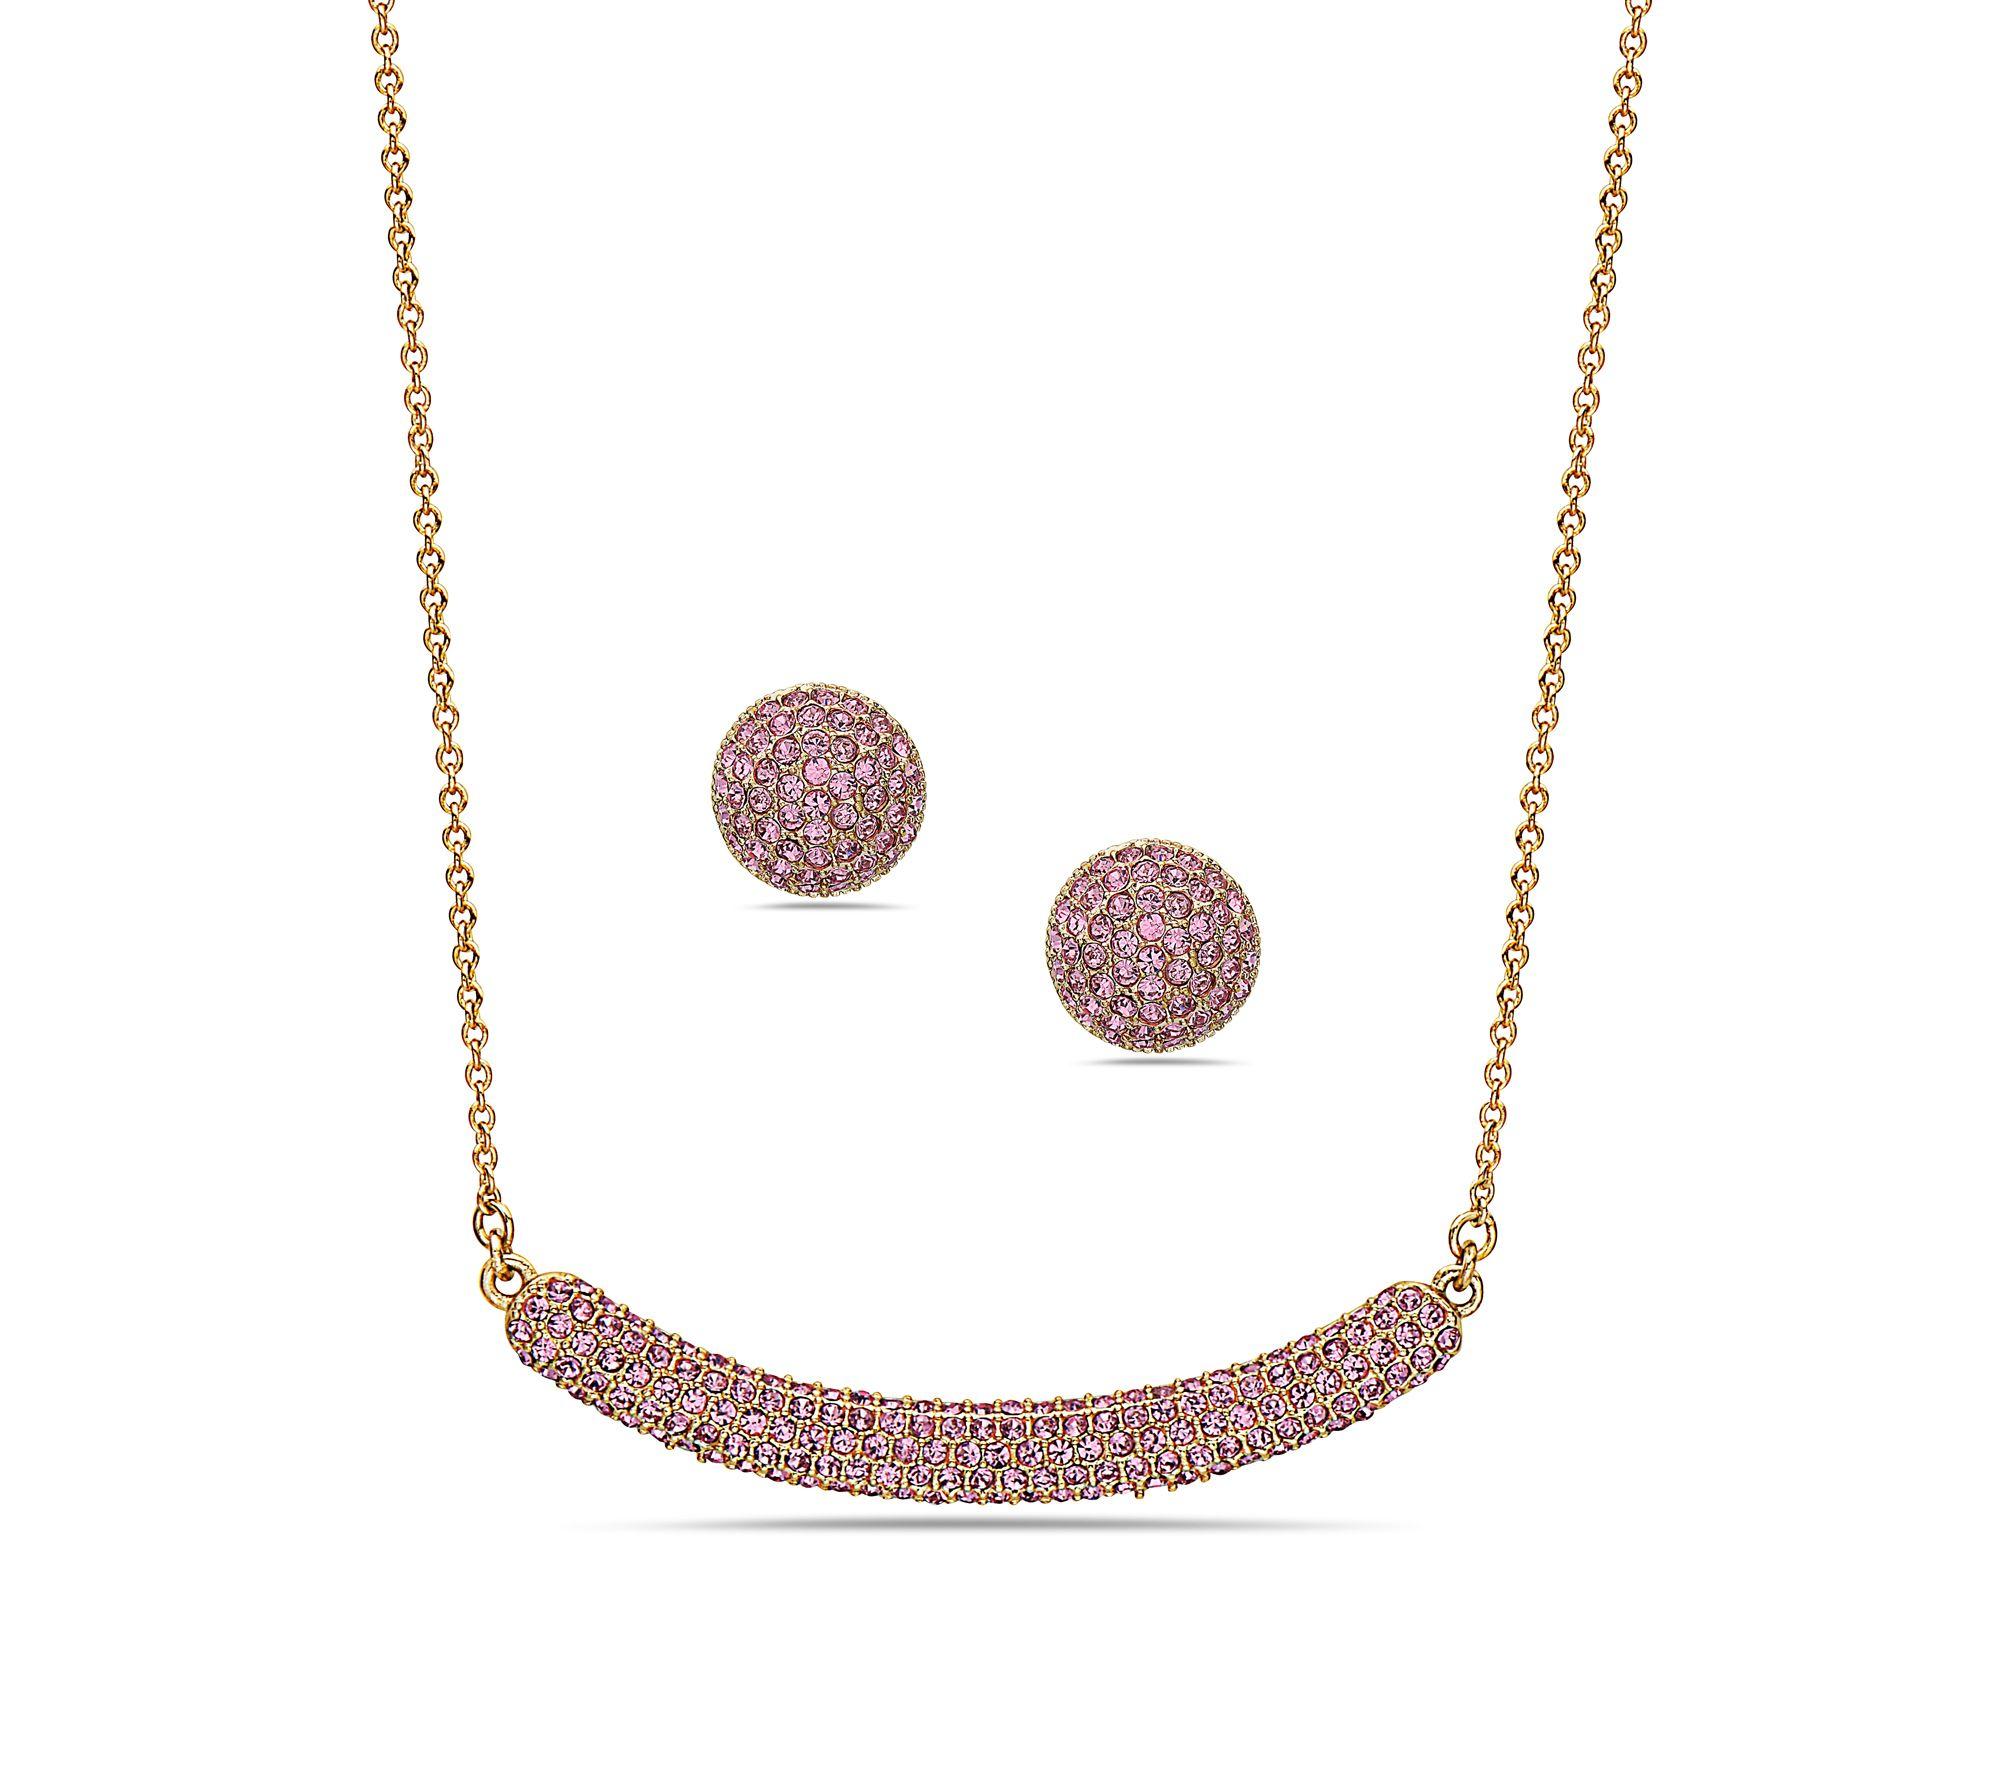 Nina Jewelry Swarovski Necklace Pave Stud Earring Set Qvc